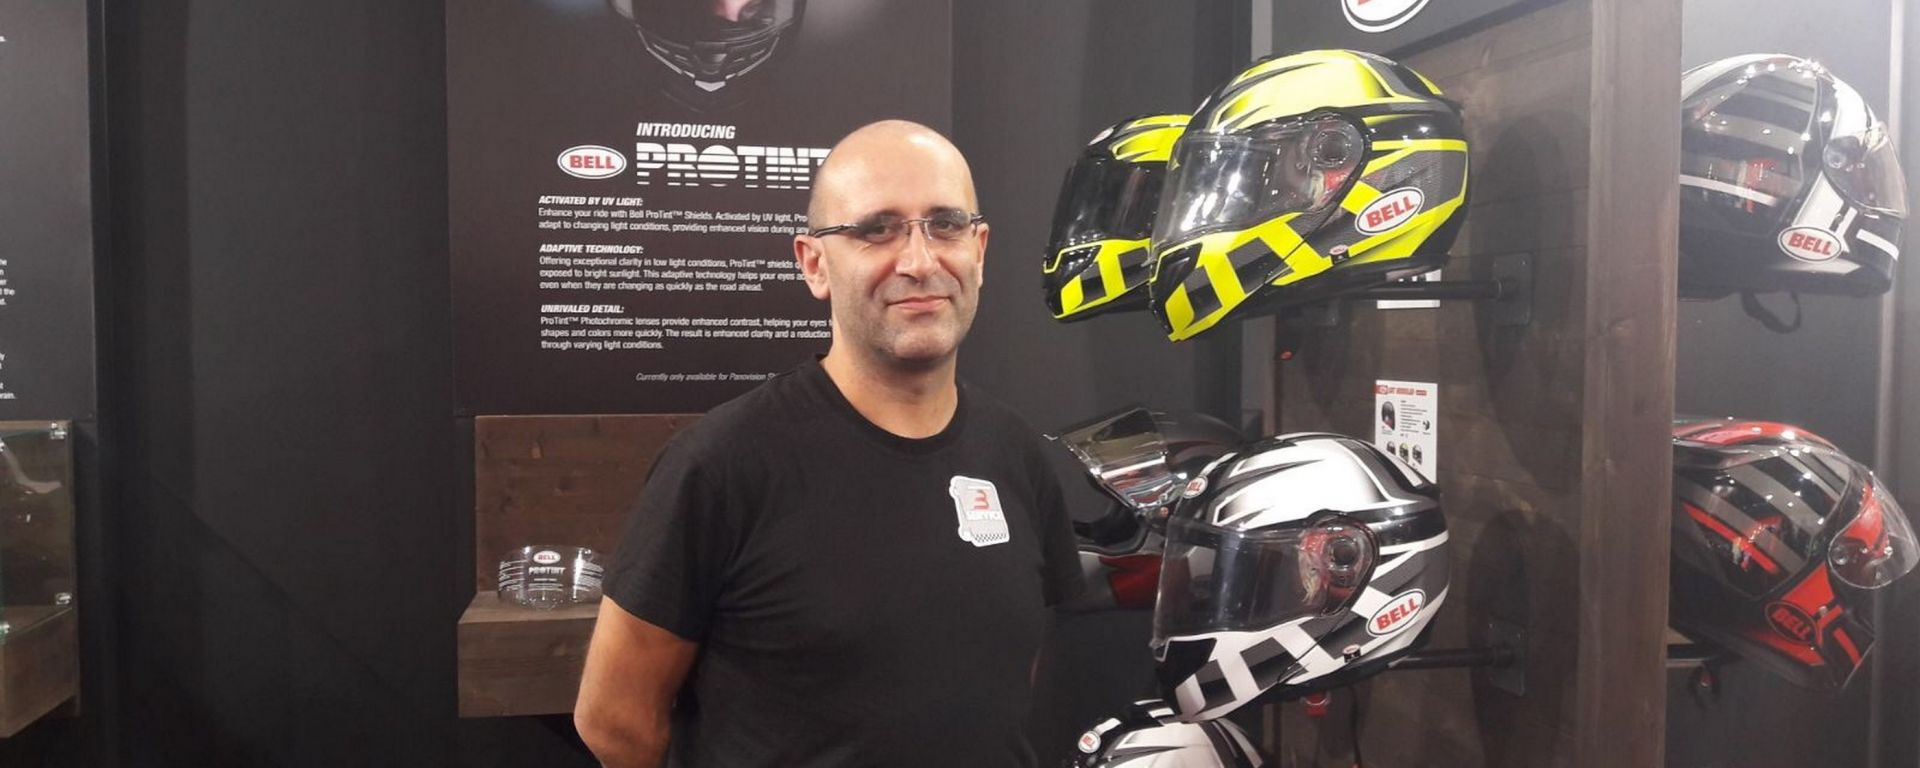 Massimiliano Savioli, Product Manager di Bergamaschi